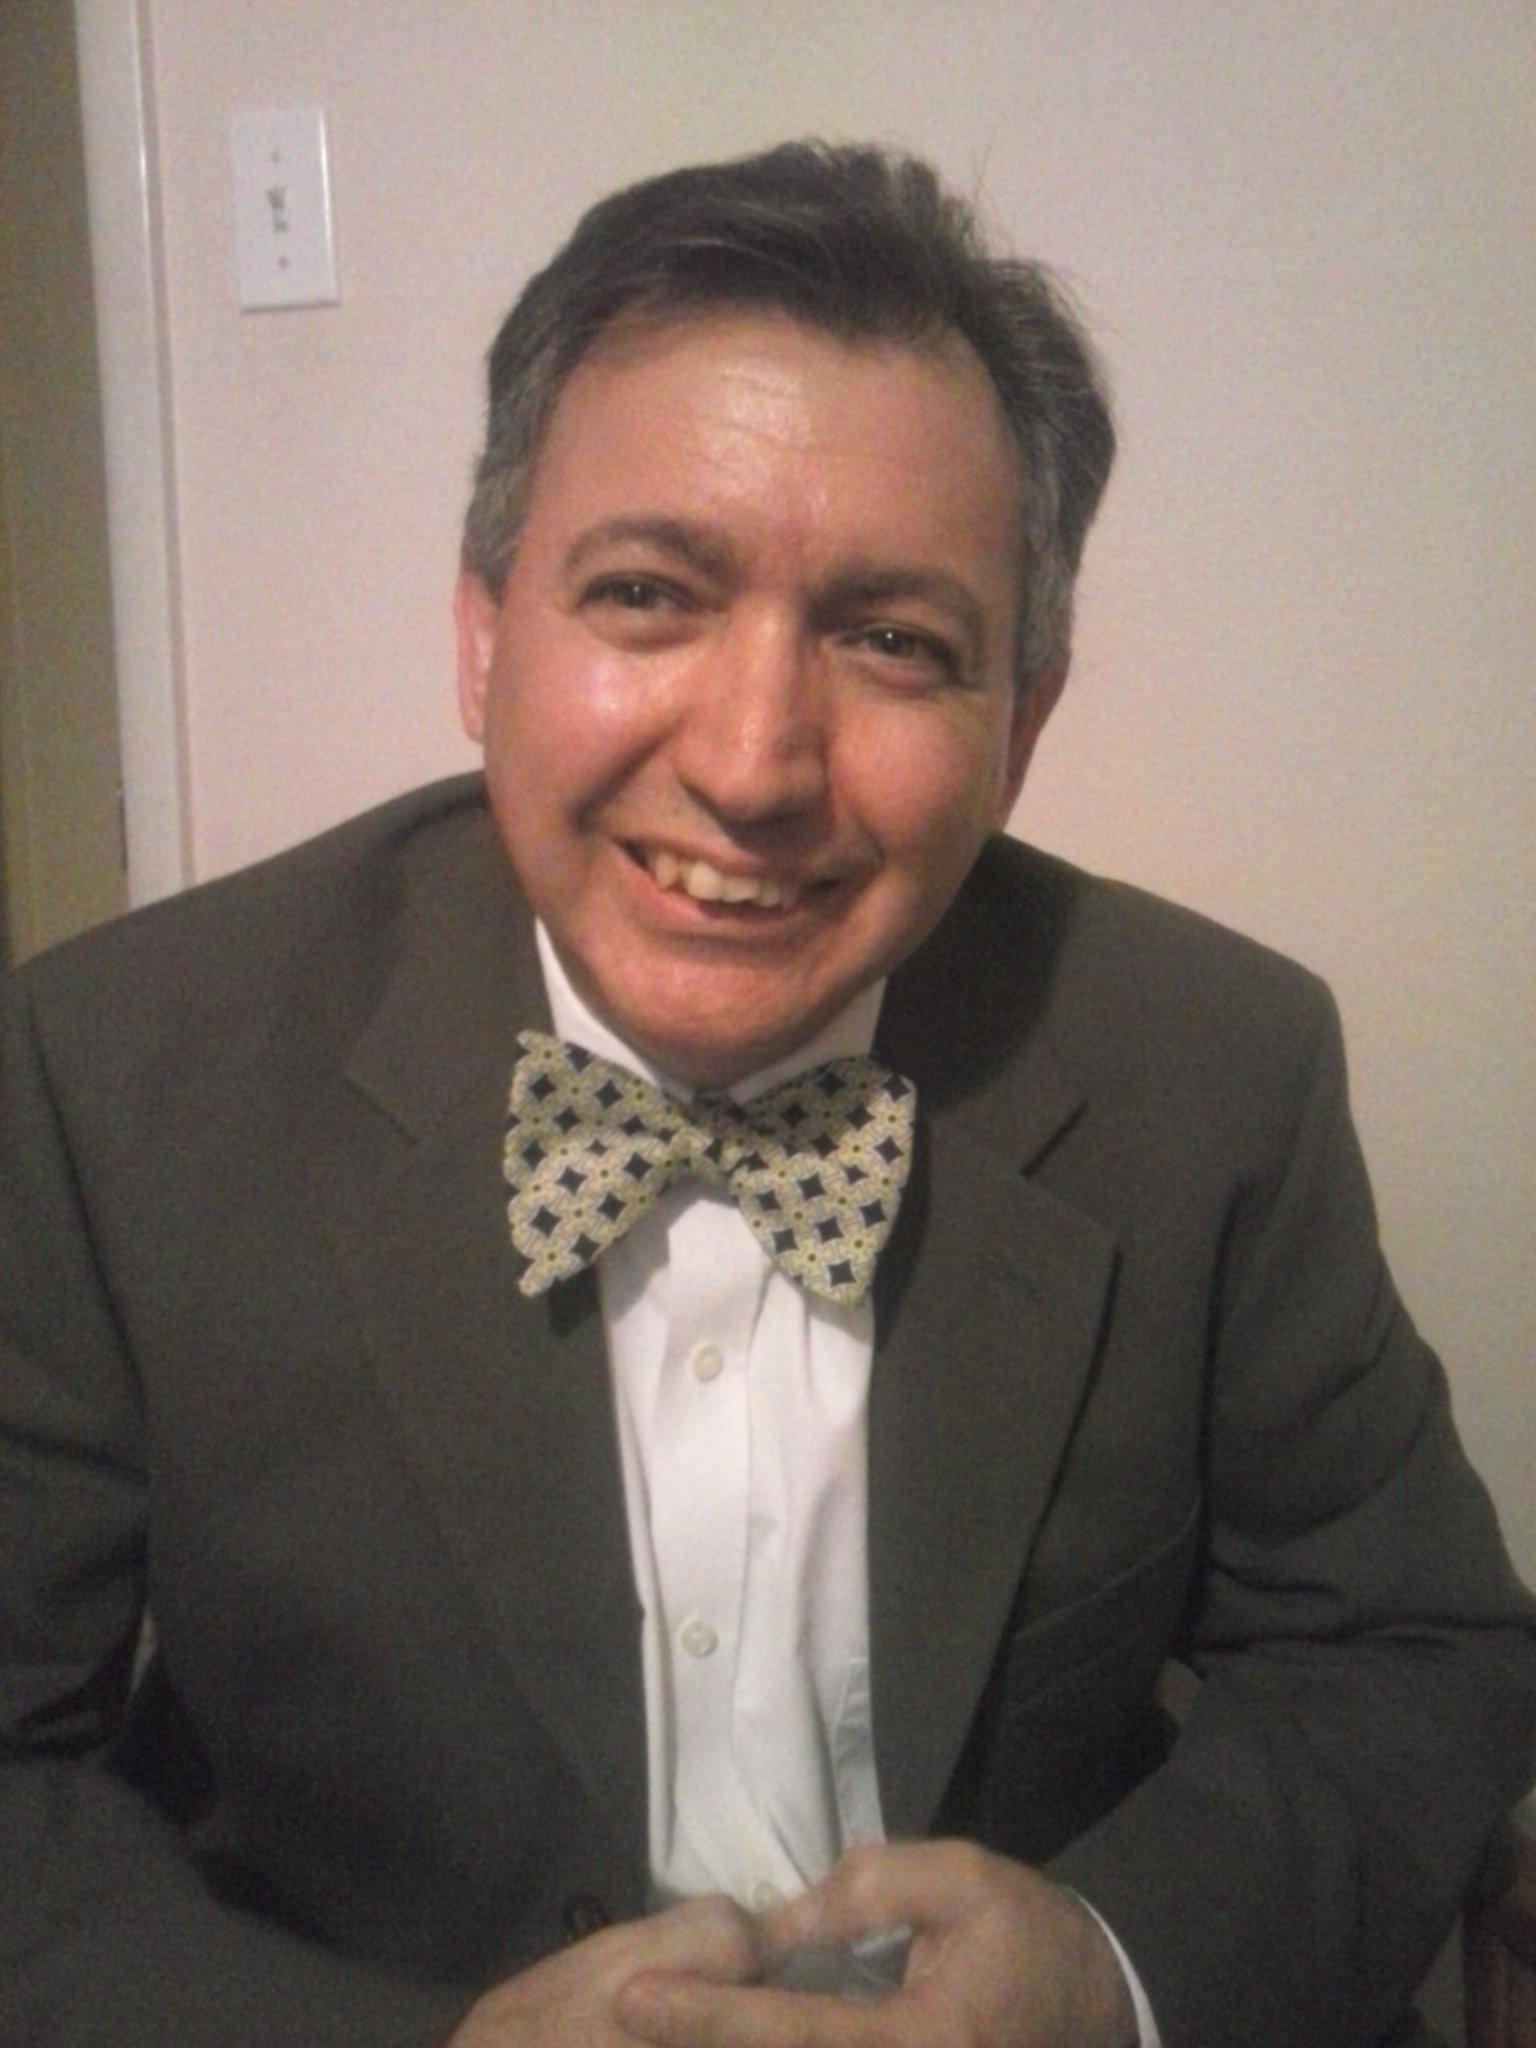 Gregory Lopez, financial advisor Stateline NV